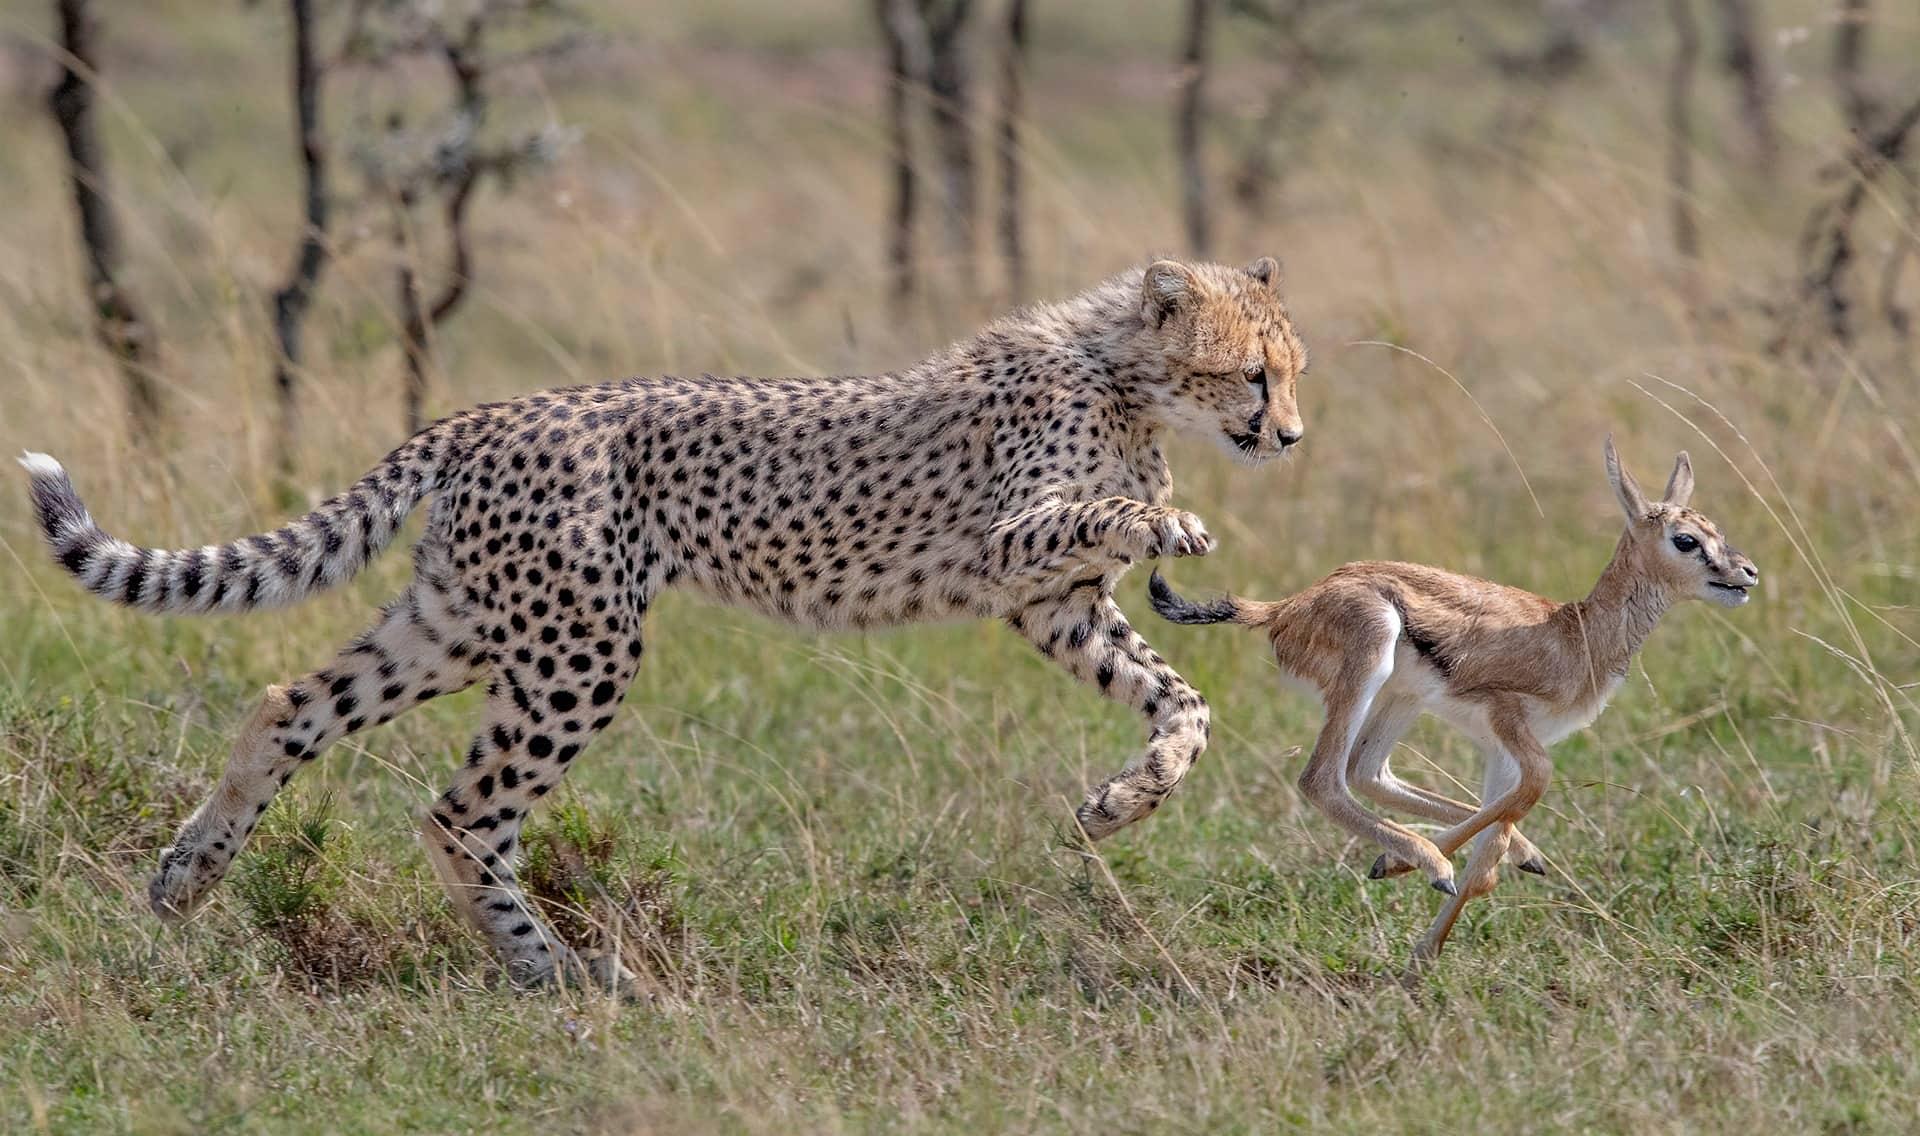 Cheetah cub and fawn